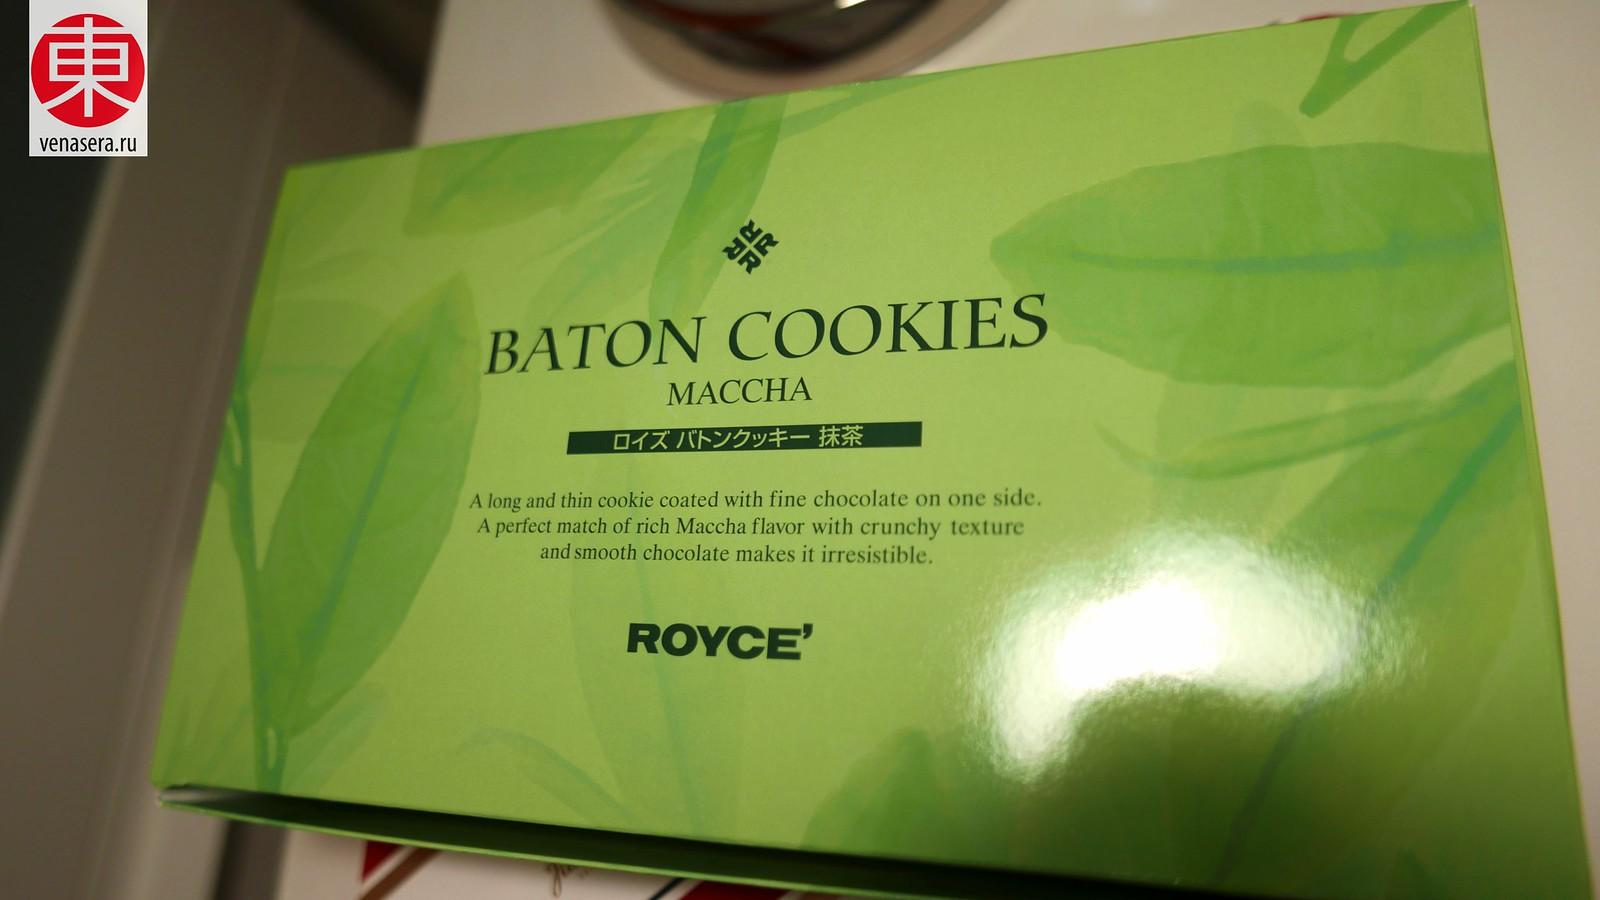 Royce Baton Cookies (抹茶)